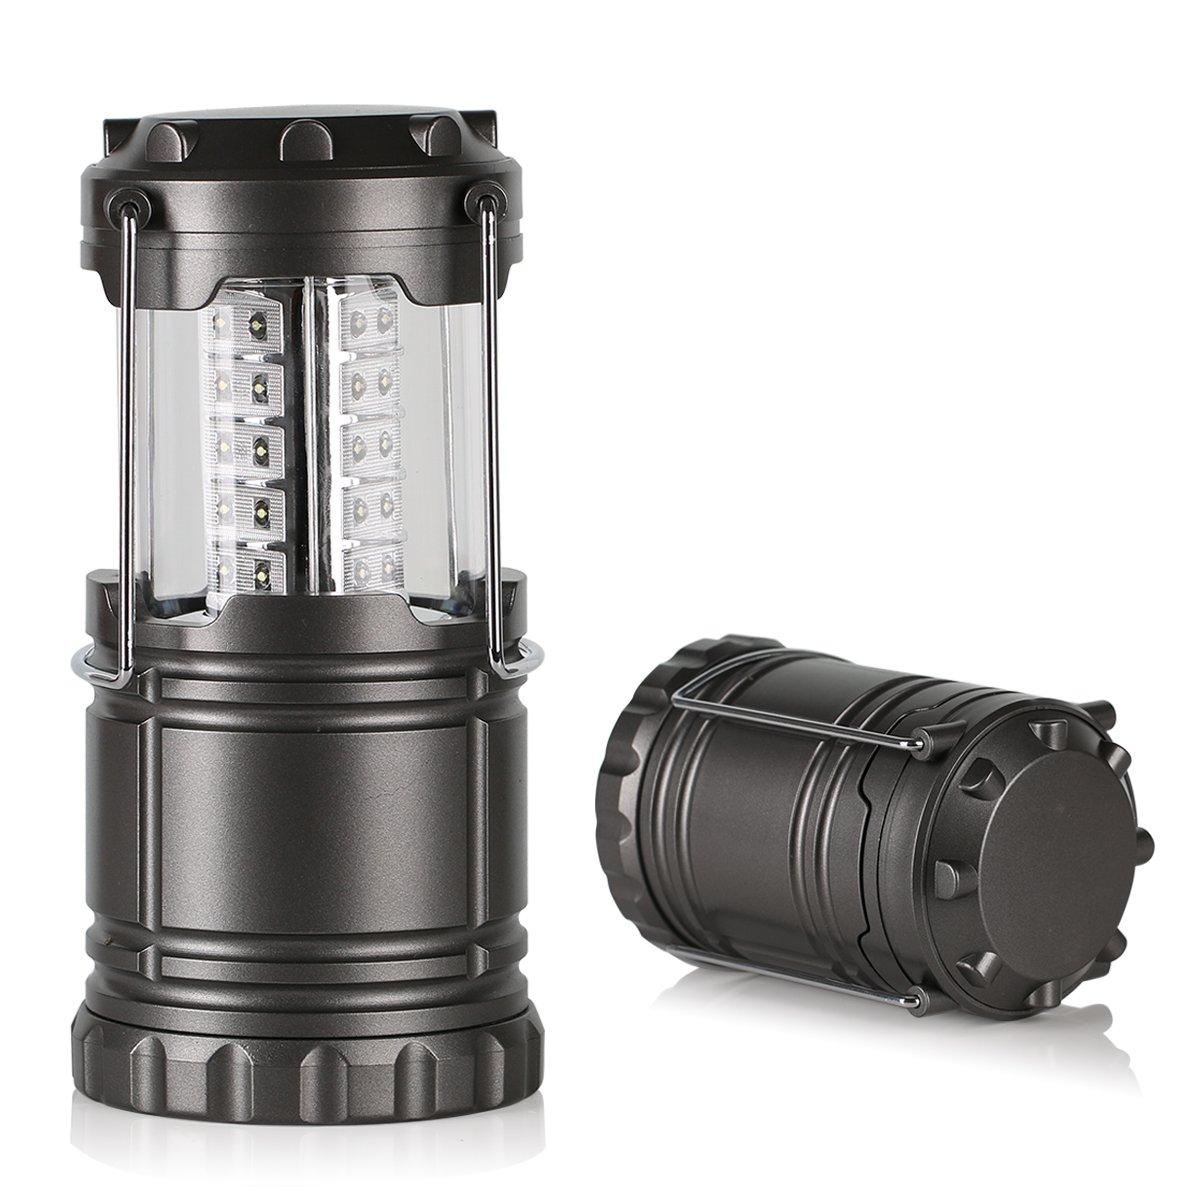 Crenova® Semptec - Linterna con 30 Bombillas LED Individuales para Camping, Color Gris